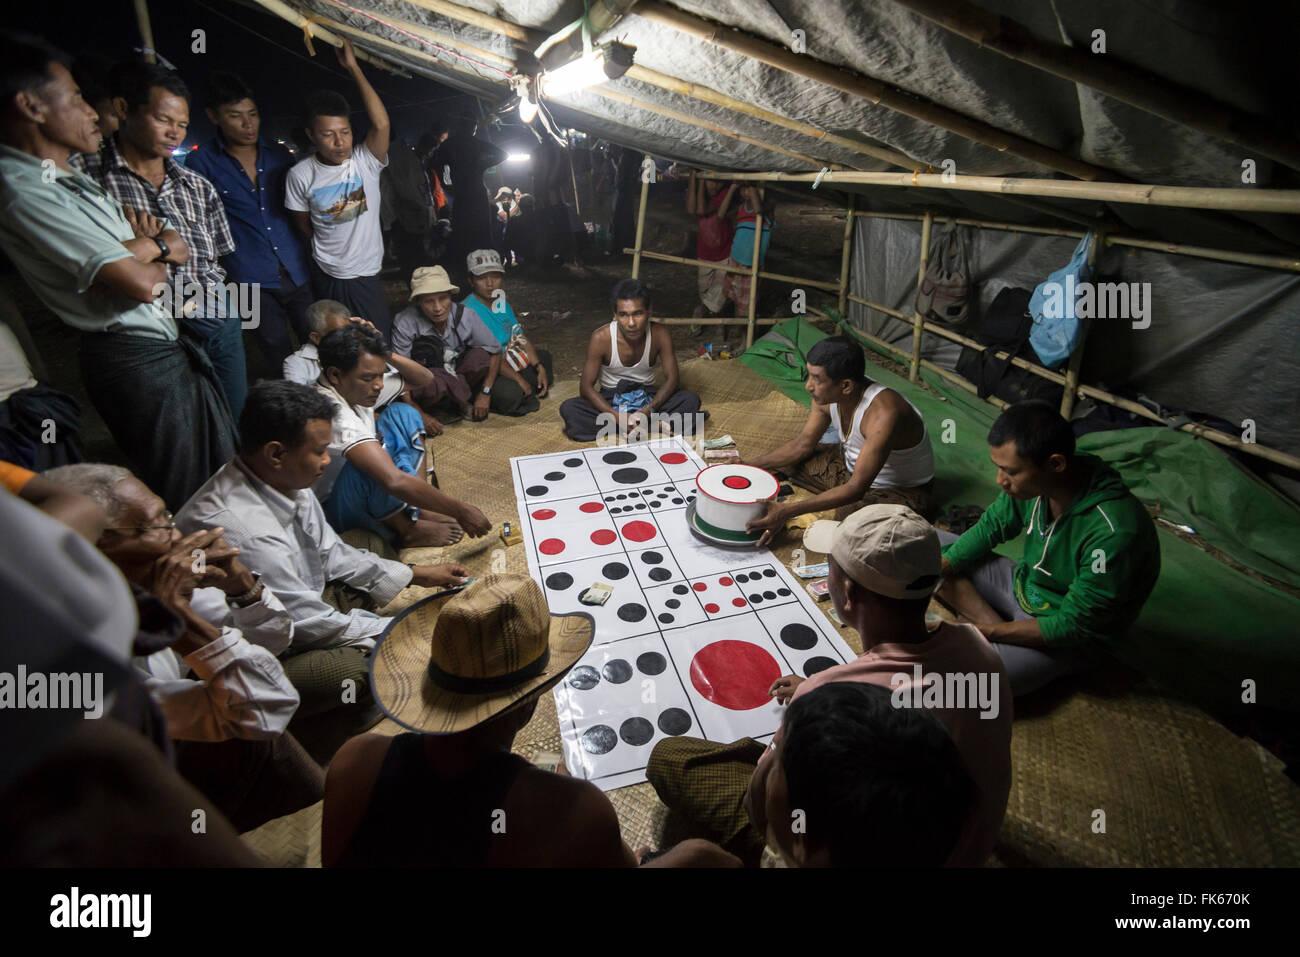 Mrauk U, gambling at Dung Bwe Festival for the passing of an important Buddhist Monk, Rakhine State, Myanmar (Burma), - Stock Image